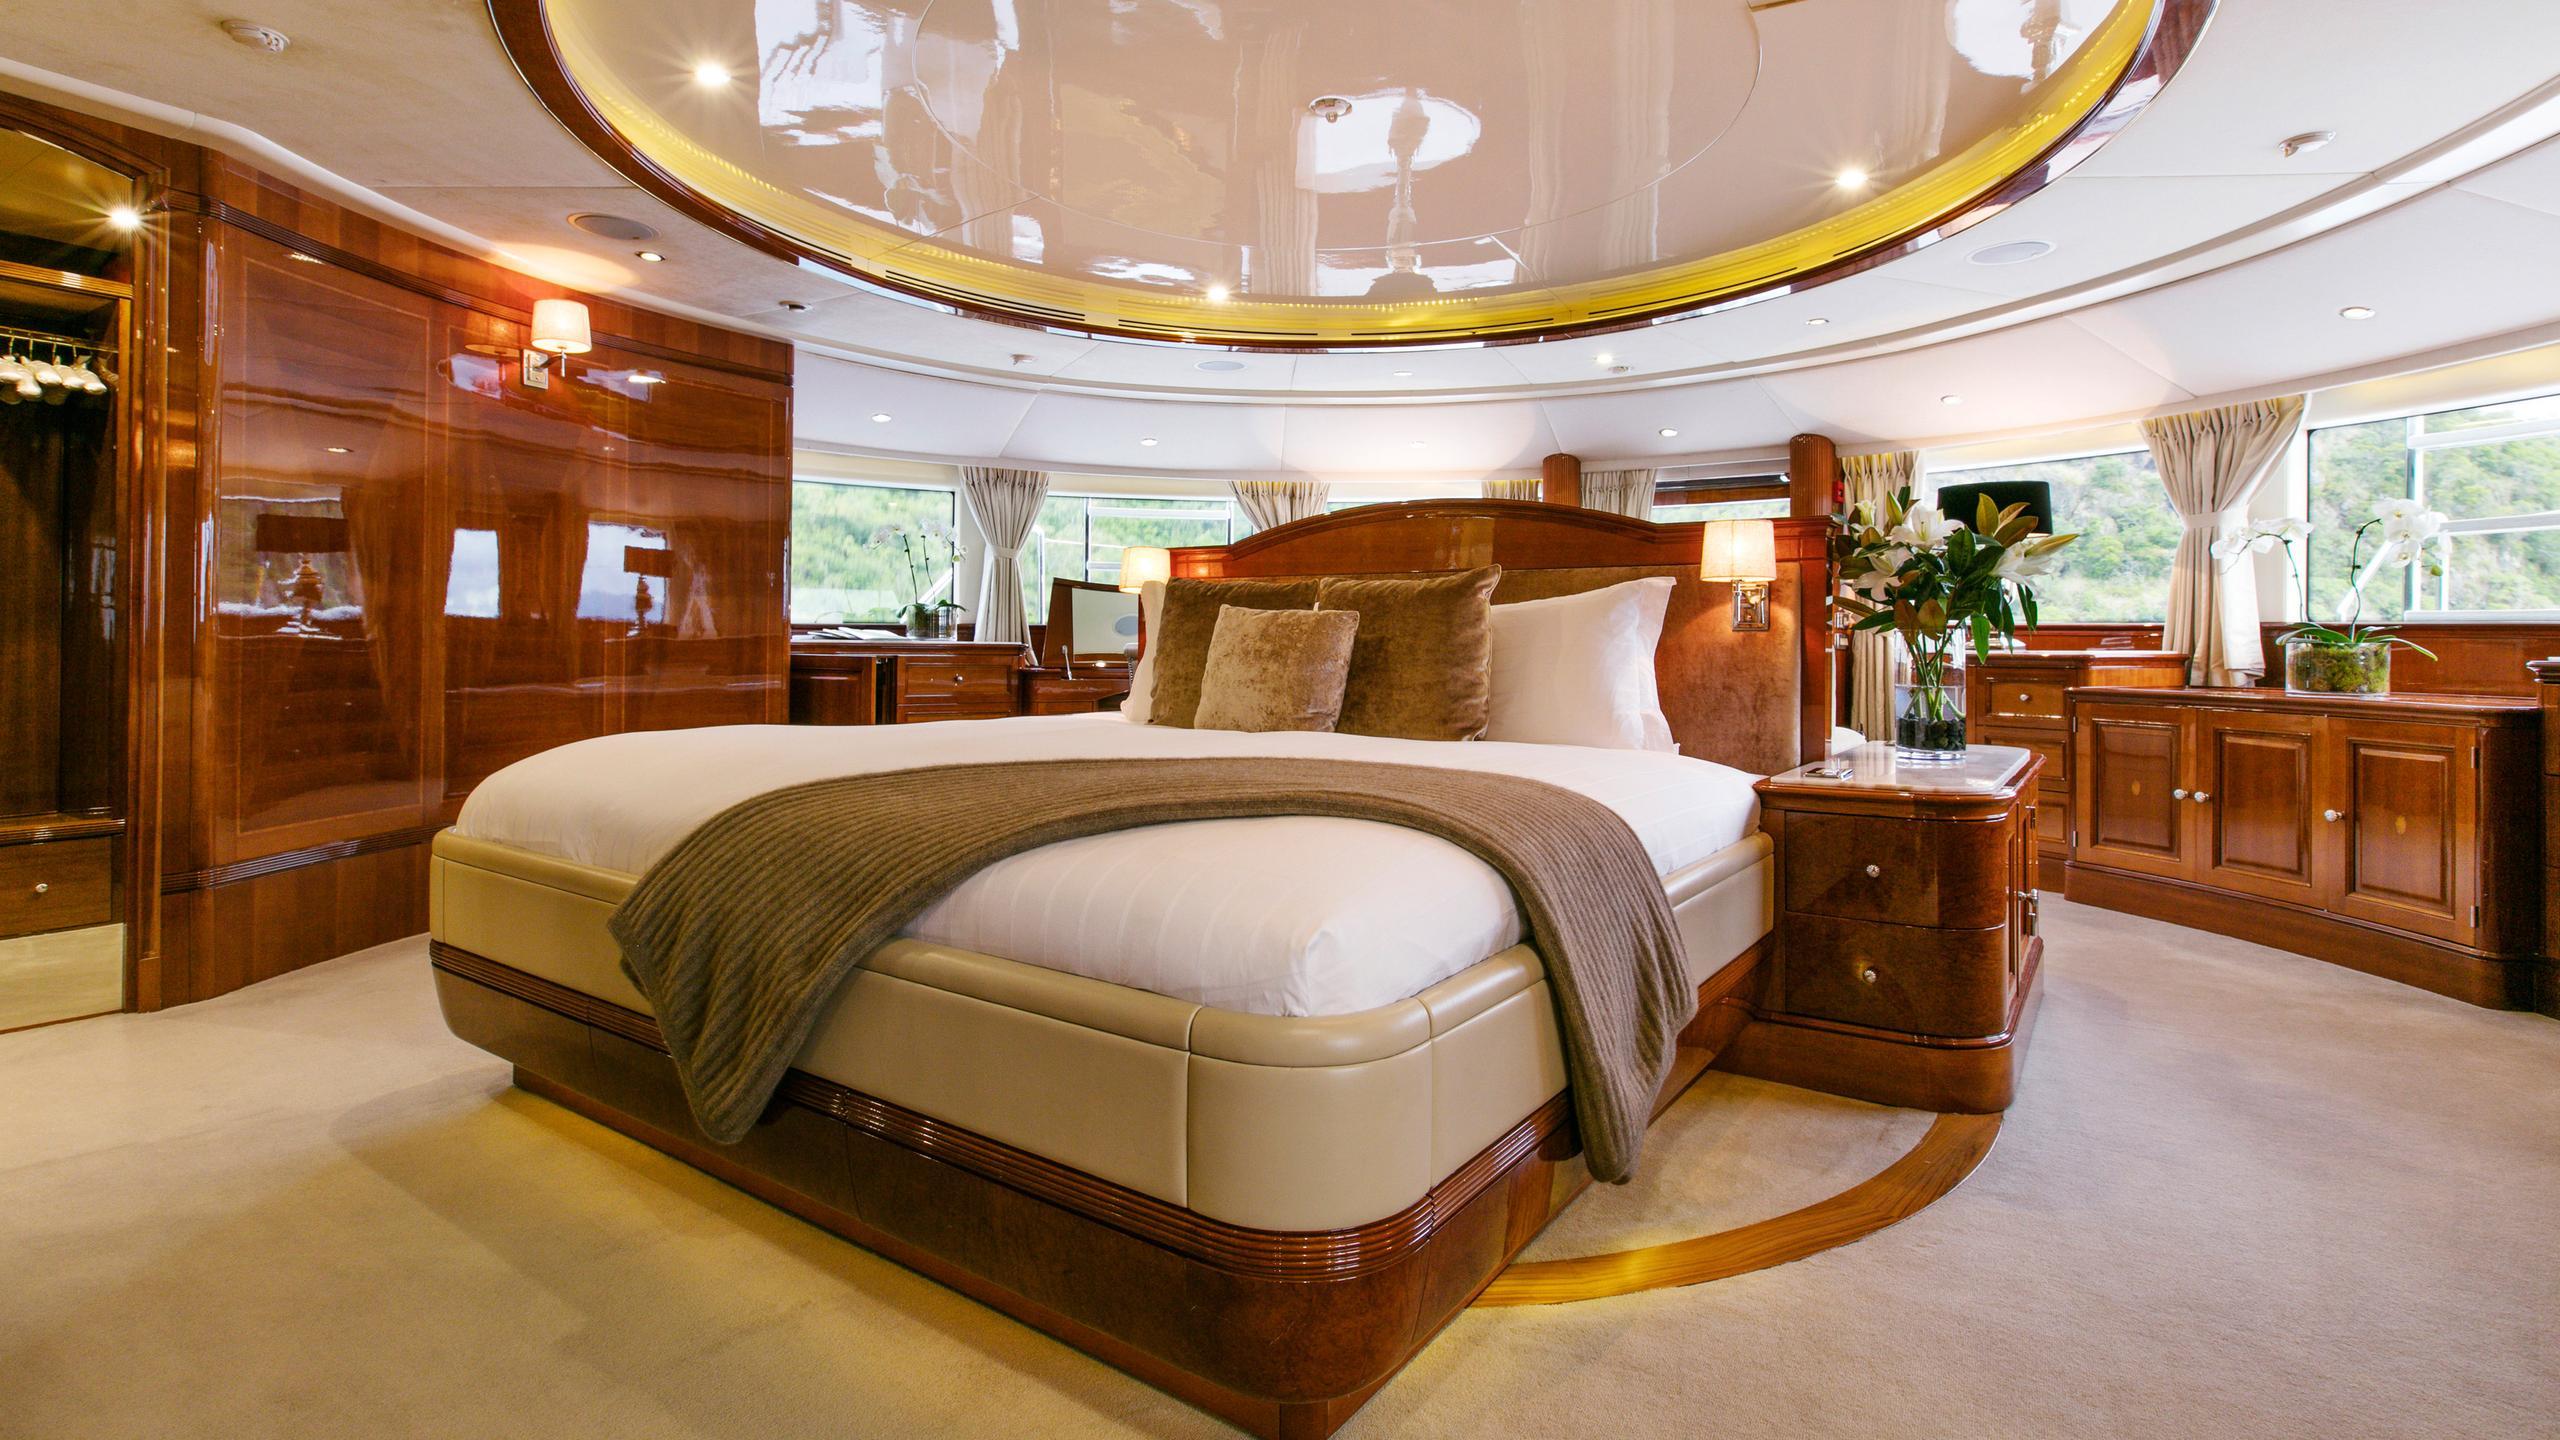 sovereign-motor-yacht-benetti-2002-44m-cabin-double